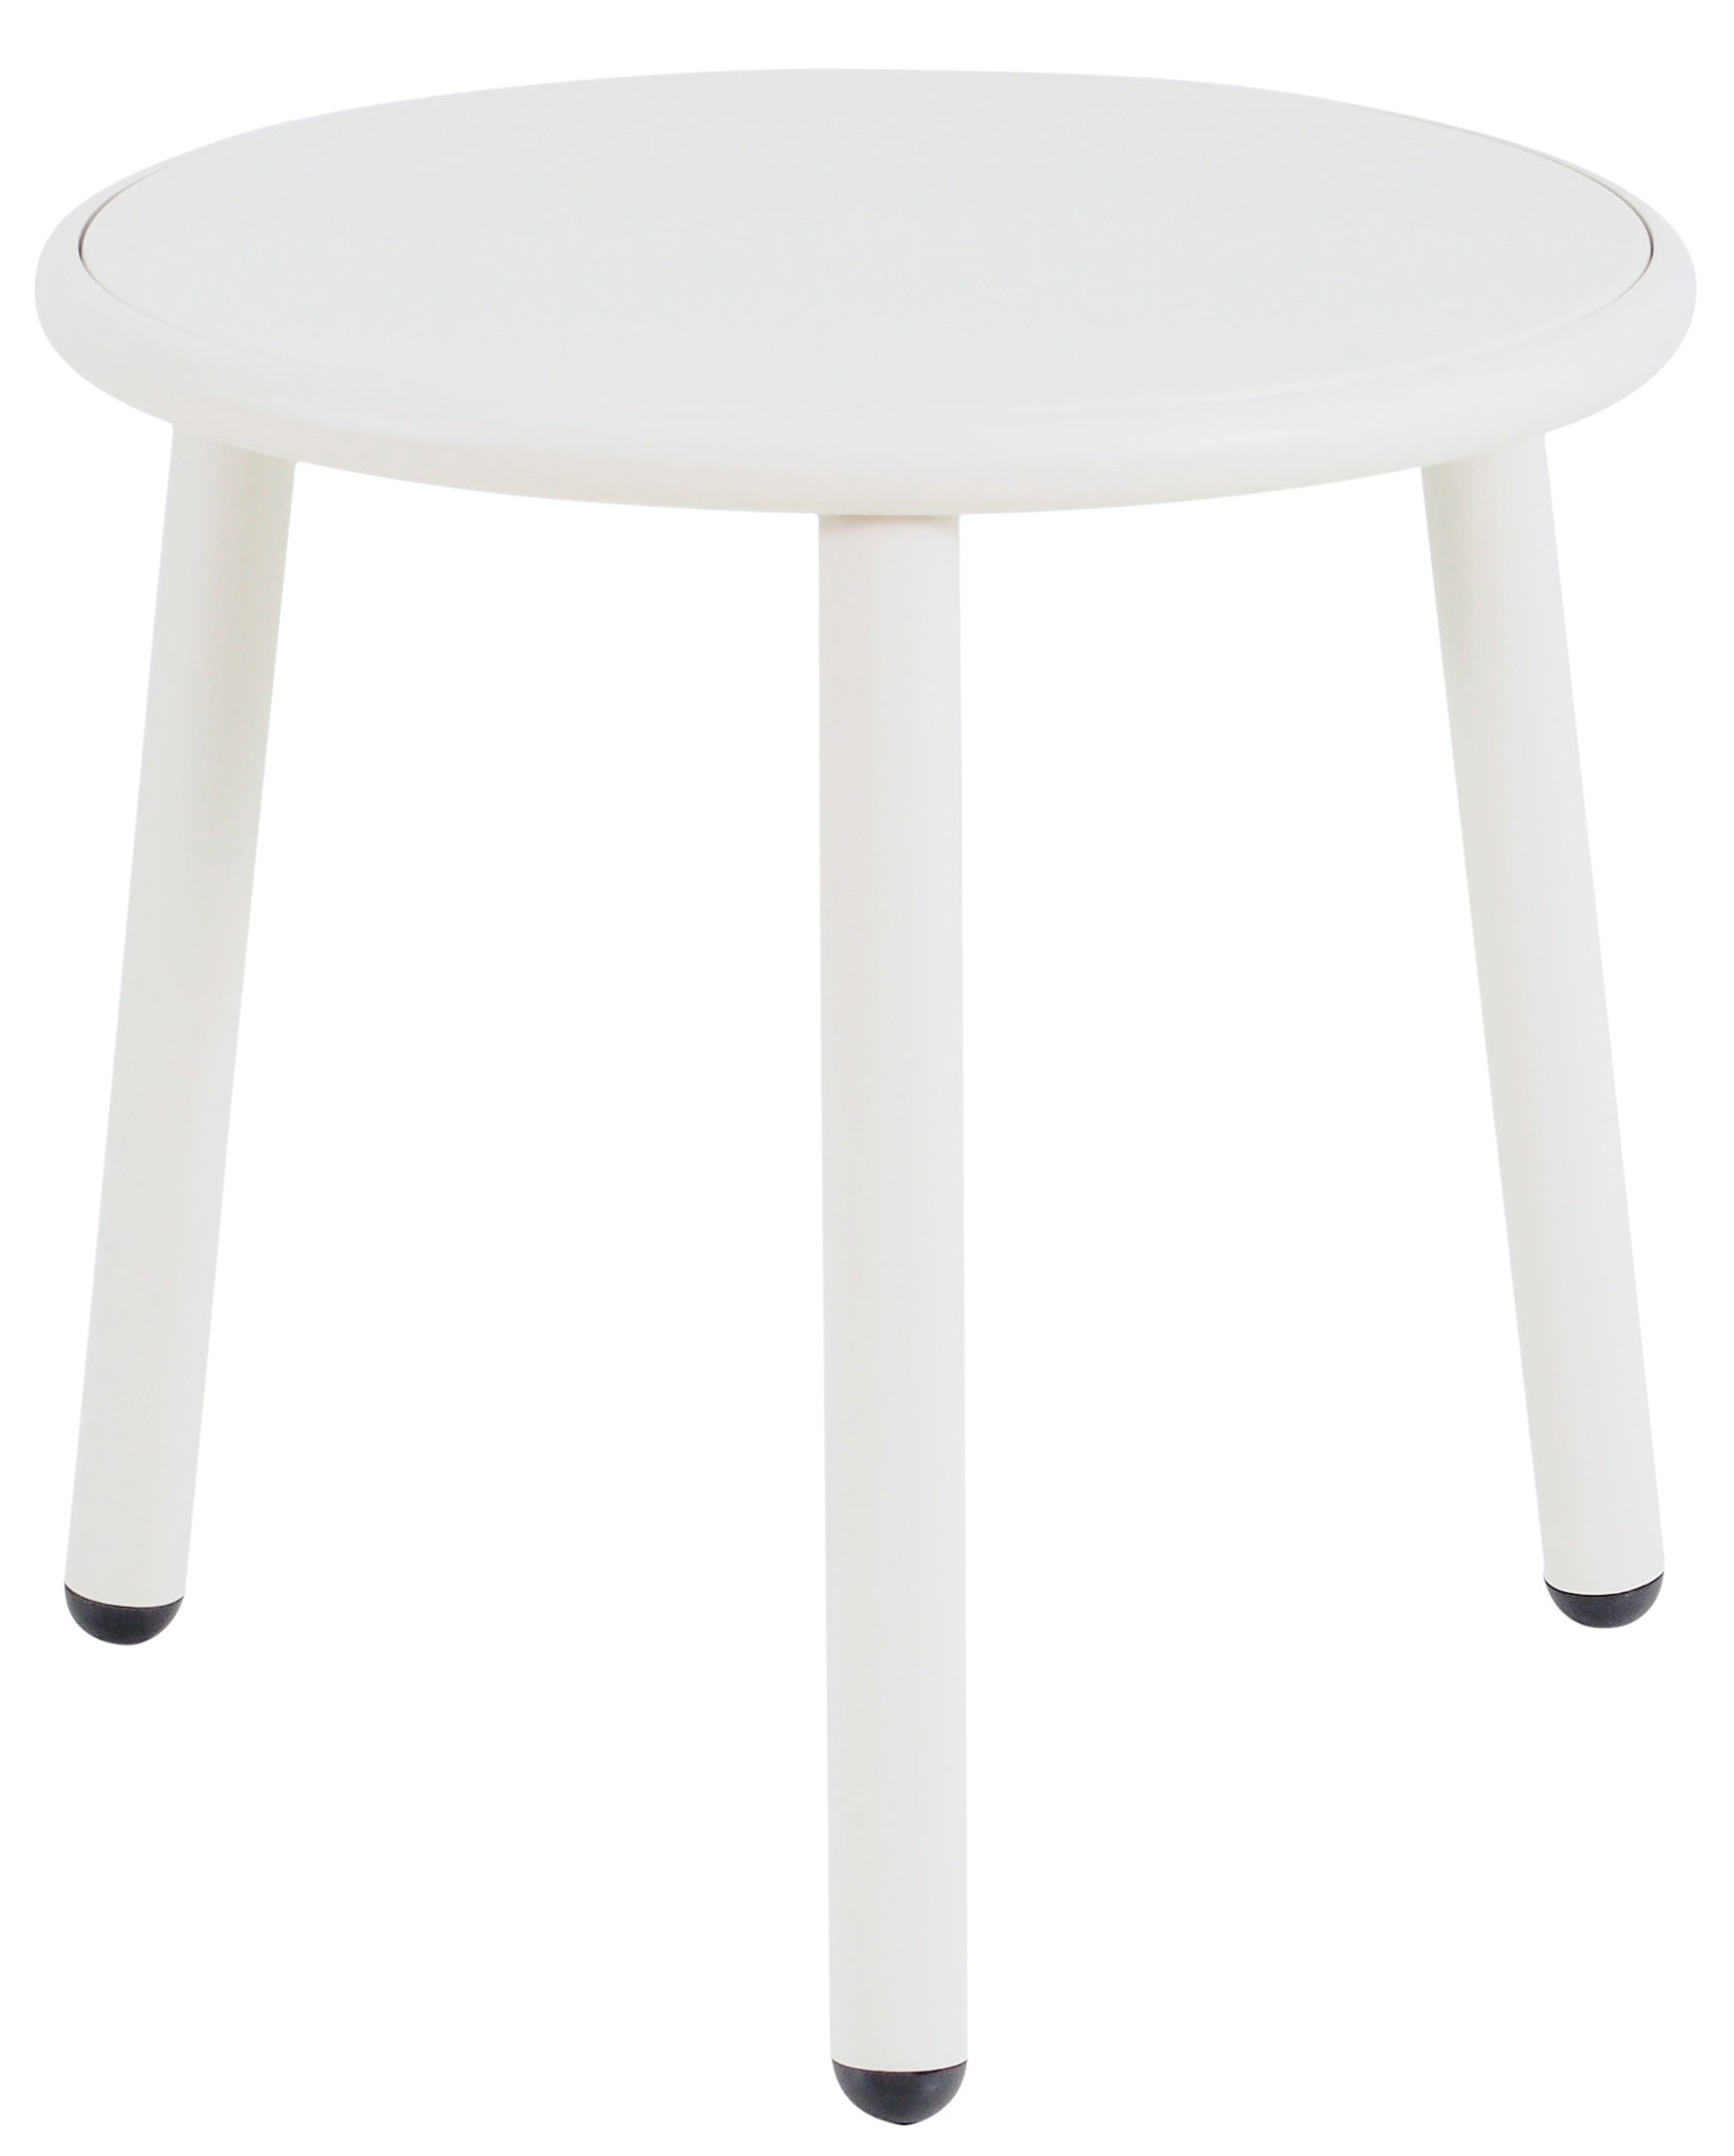 Mobilier - Tables basses - Table basse Yard / Ø 50 cm - Emu - Blanc / Plateau blanc - Aluminium verni